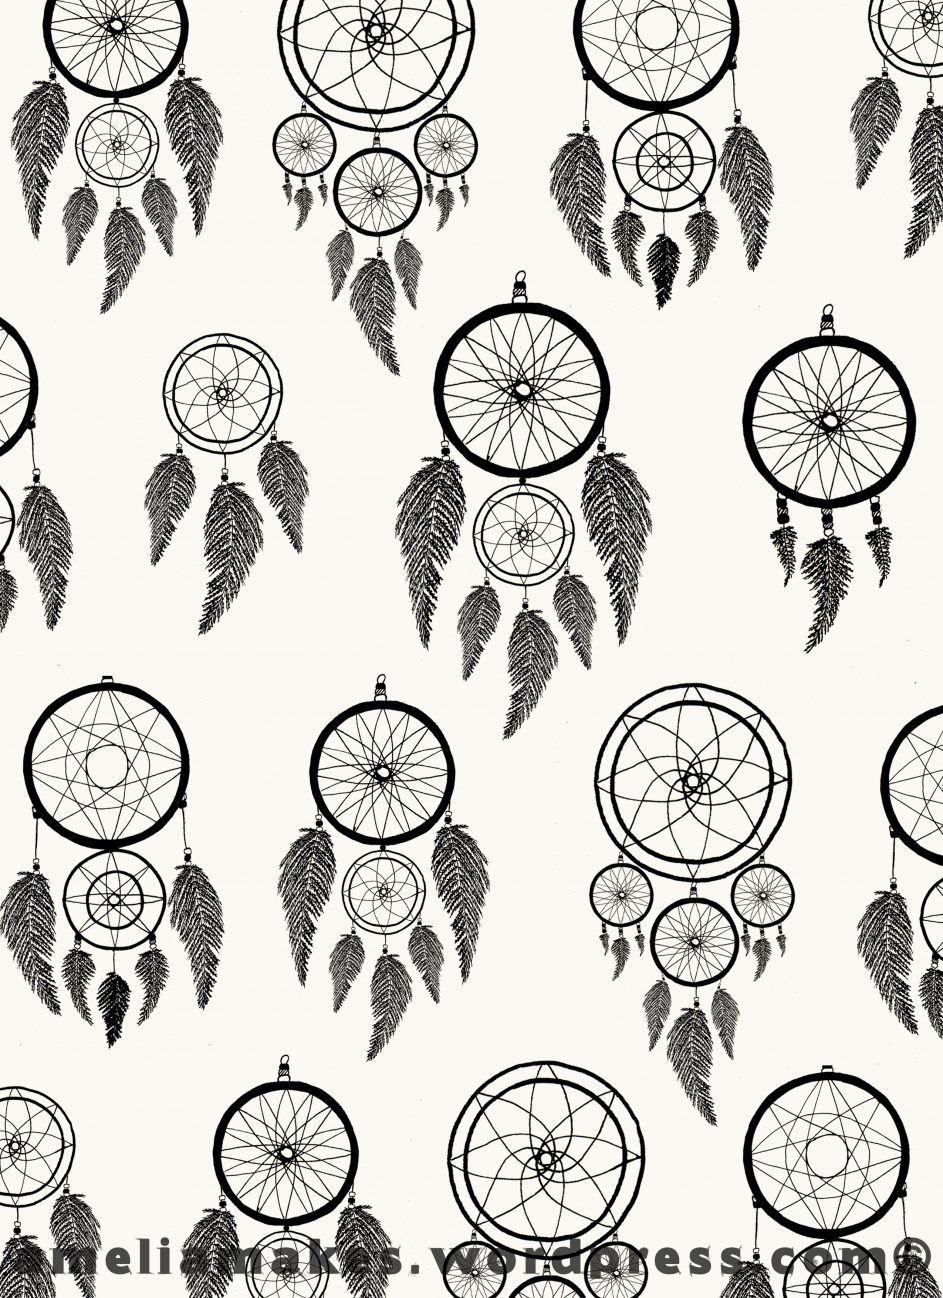 Cozy Dreamcatcher Weave Patterns 81 Dream Catcher Patterns